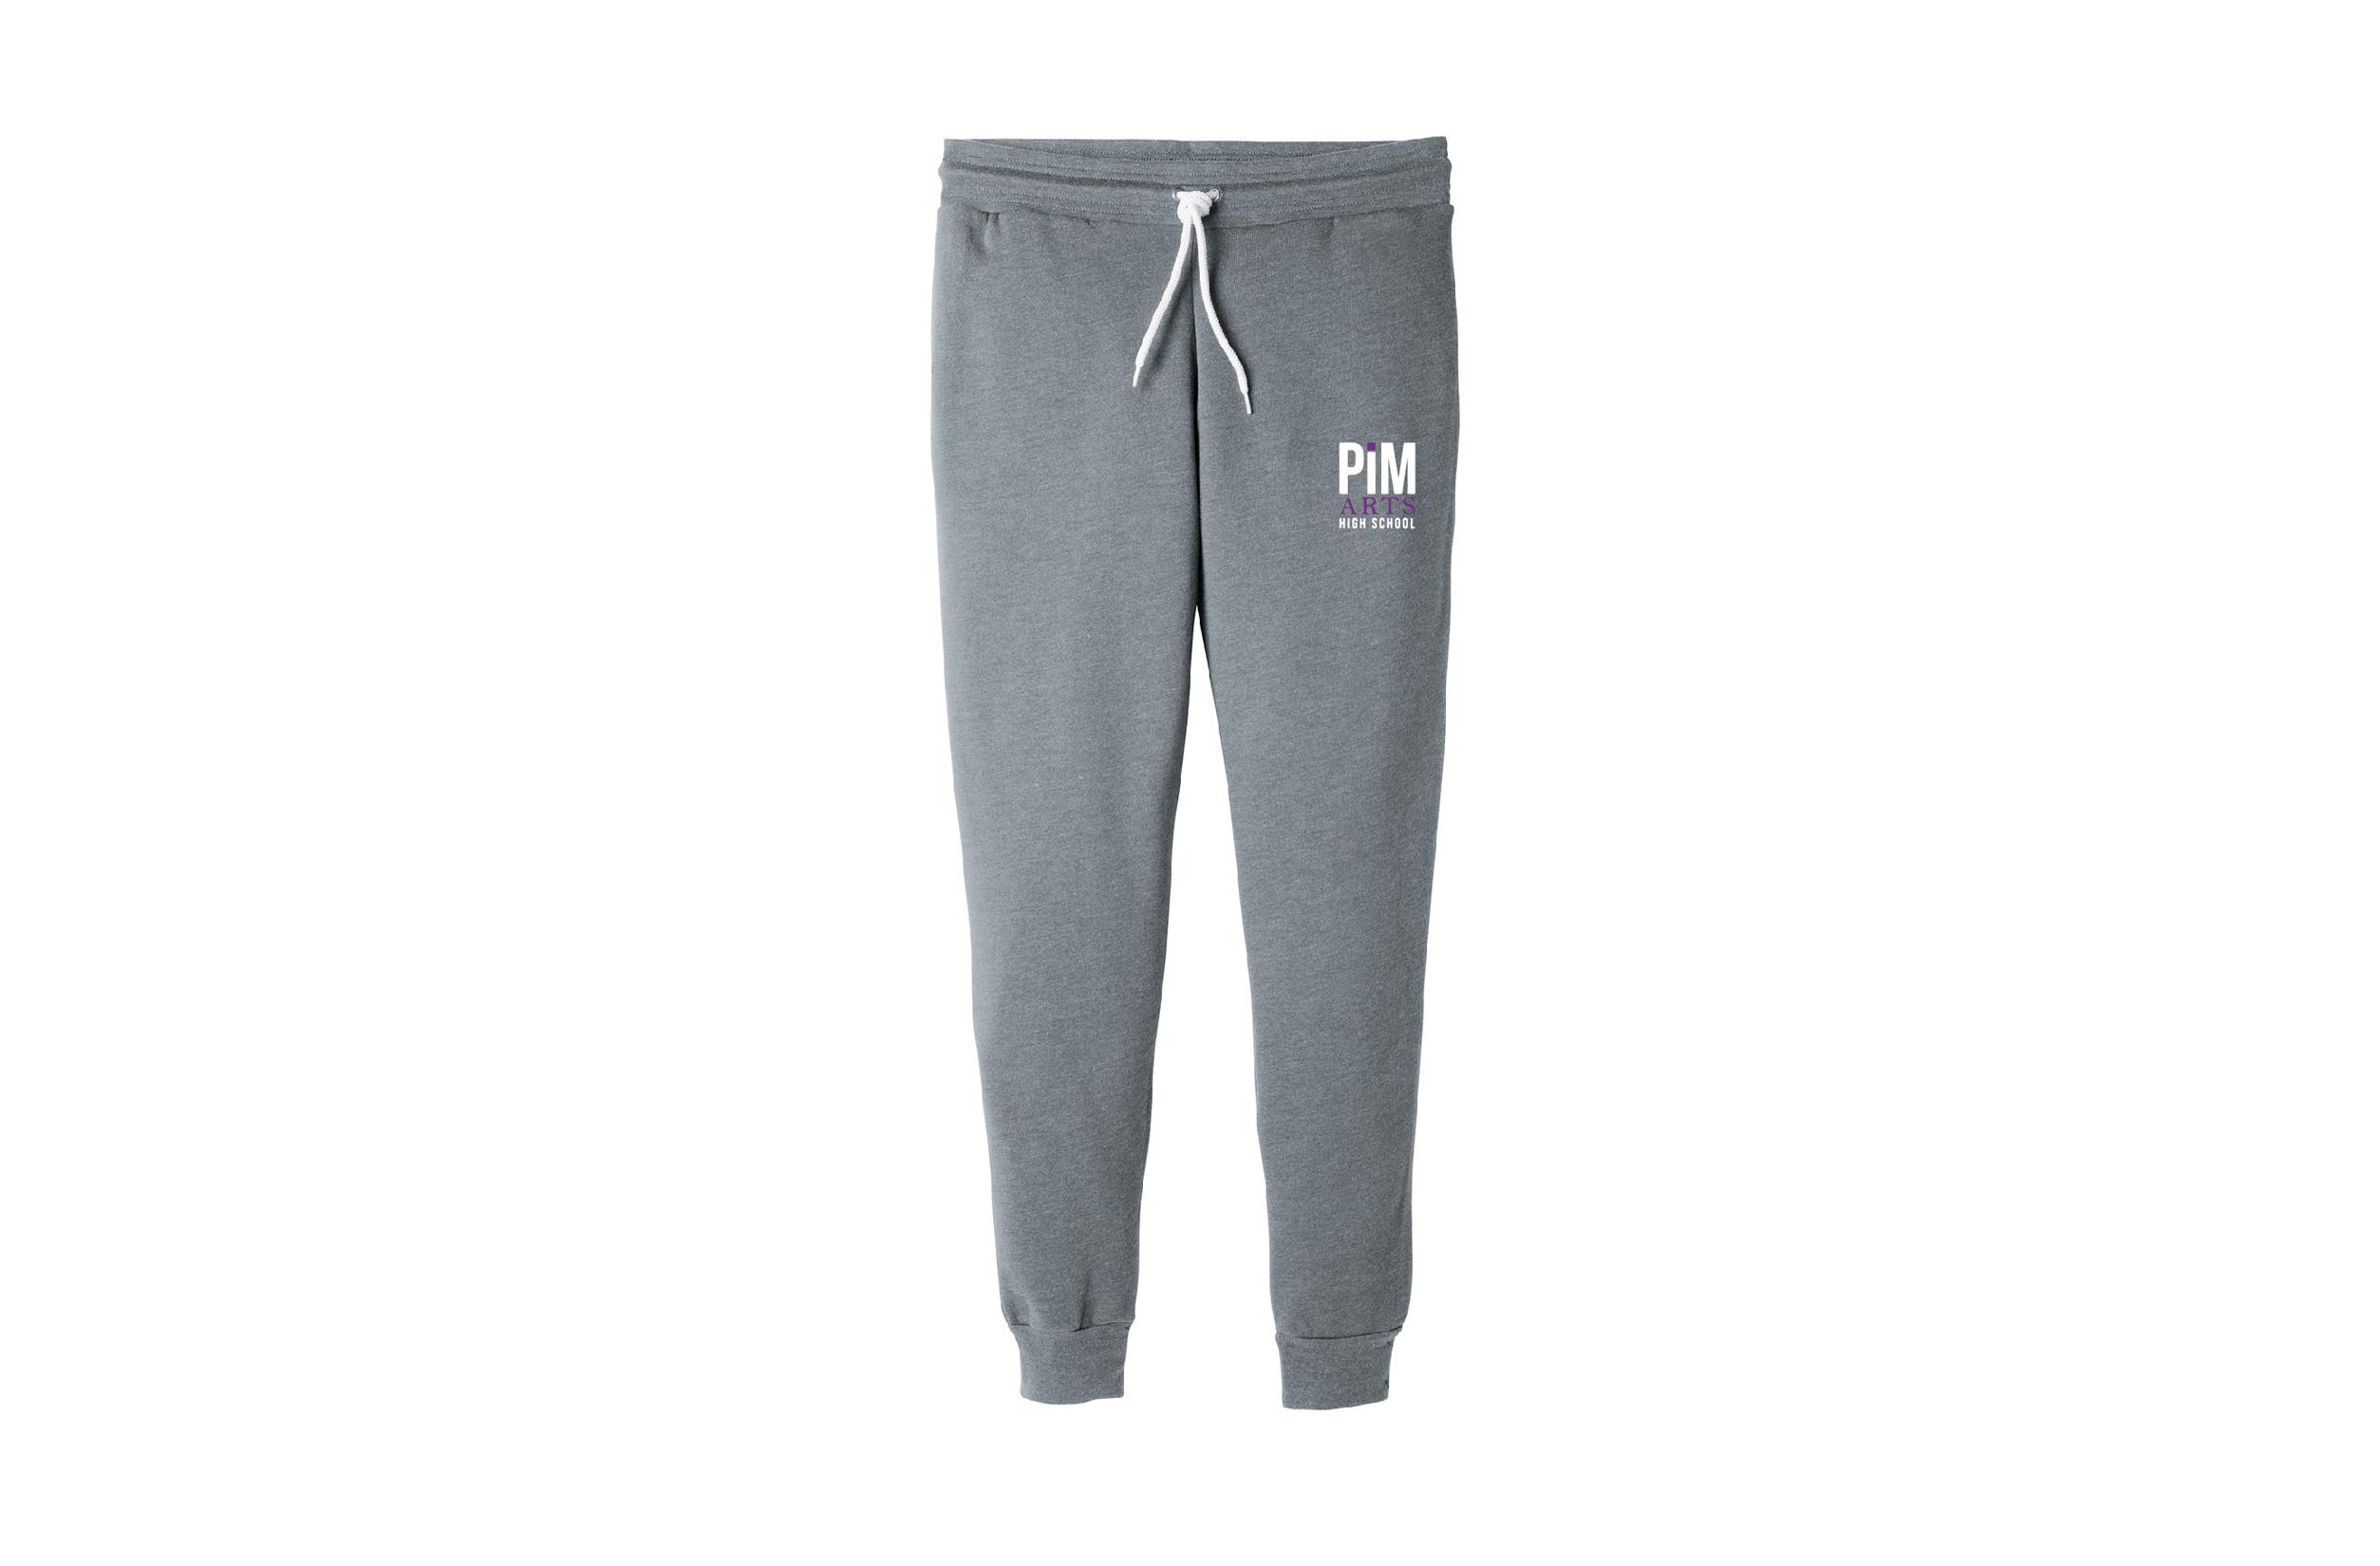 e48cb4998f8 Unisex Jogger Sweatpants - PiM Arts High School